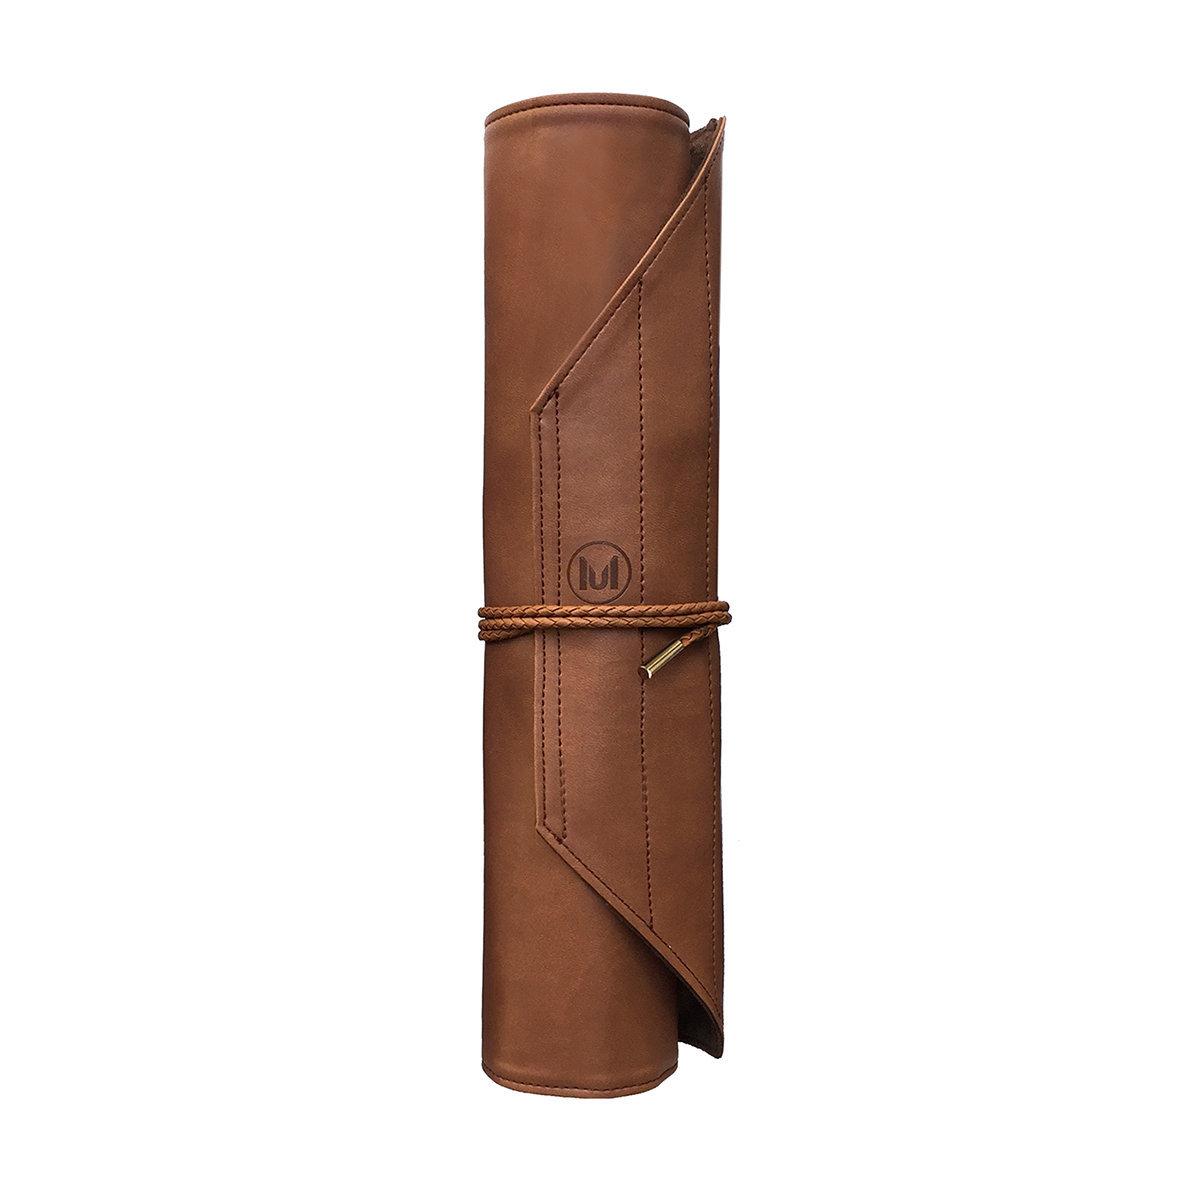 ContRoll9 - Artist M, 捲軸型工具袋 (柔棕色)